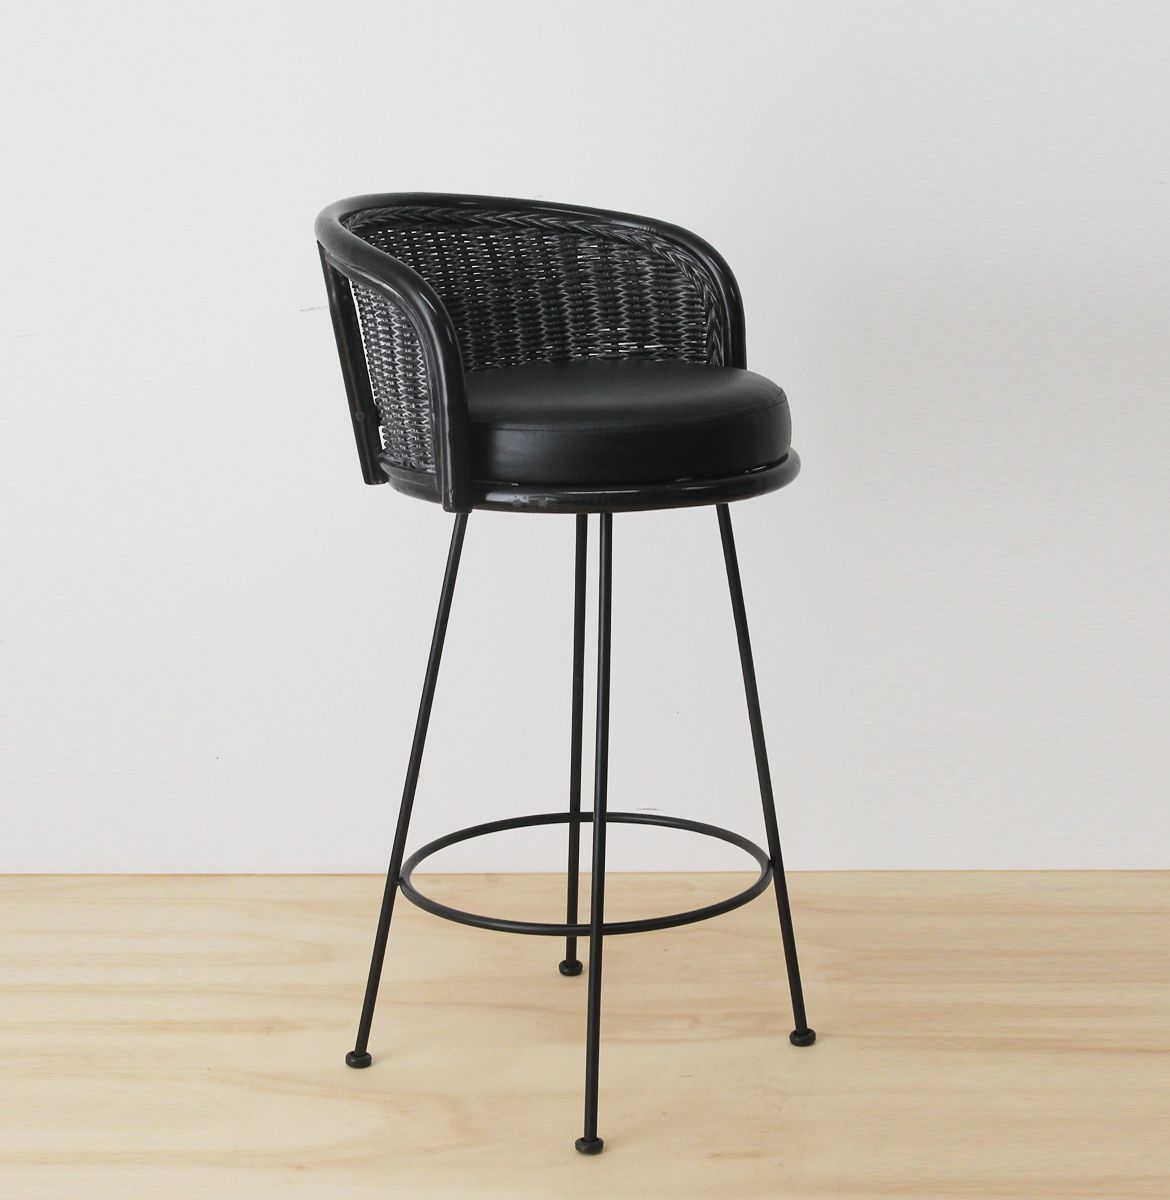 SAKE BARSTOOL | Lincoln Brooks Design & Manufacture Traditional